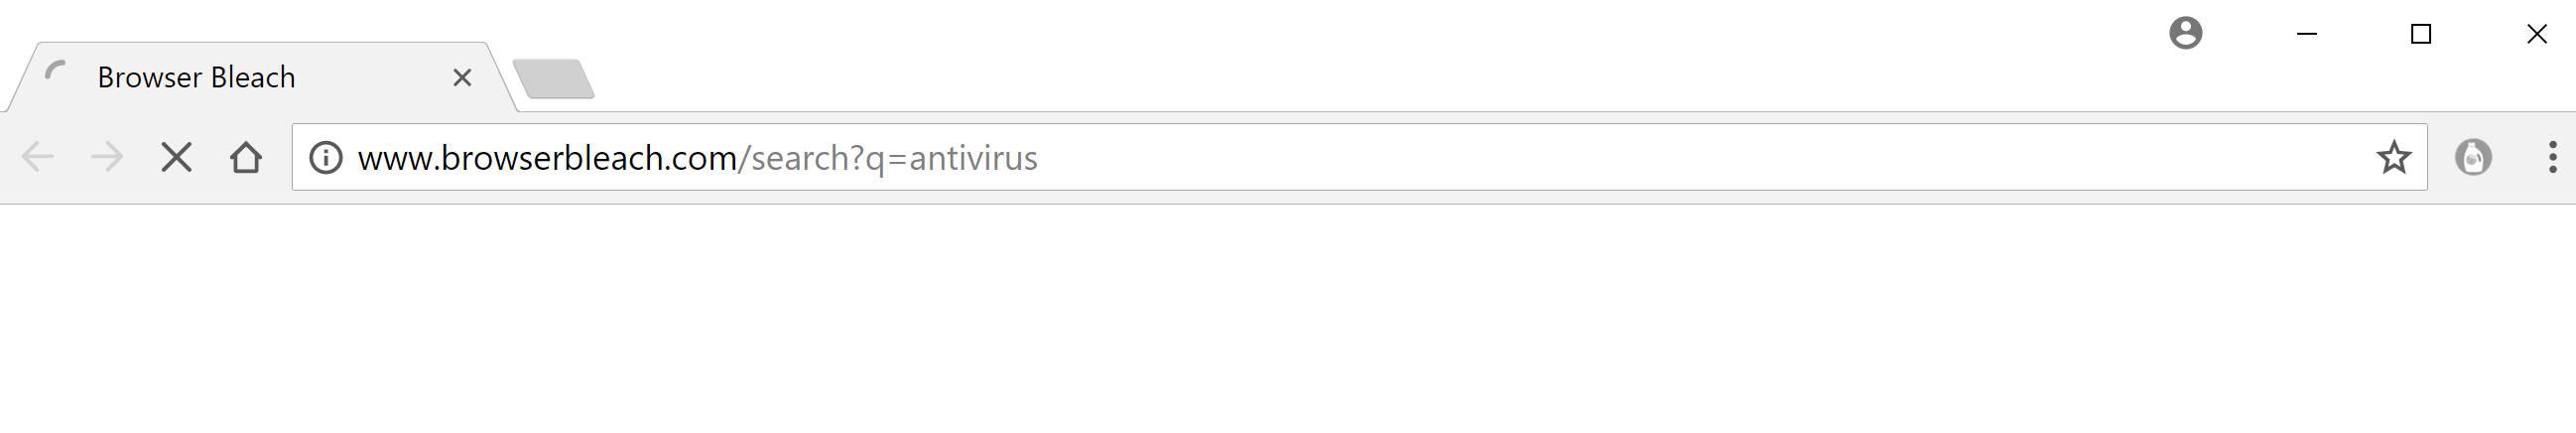 Browserbleach.com Redirect Virus